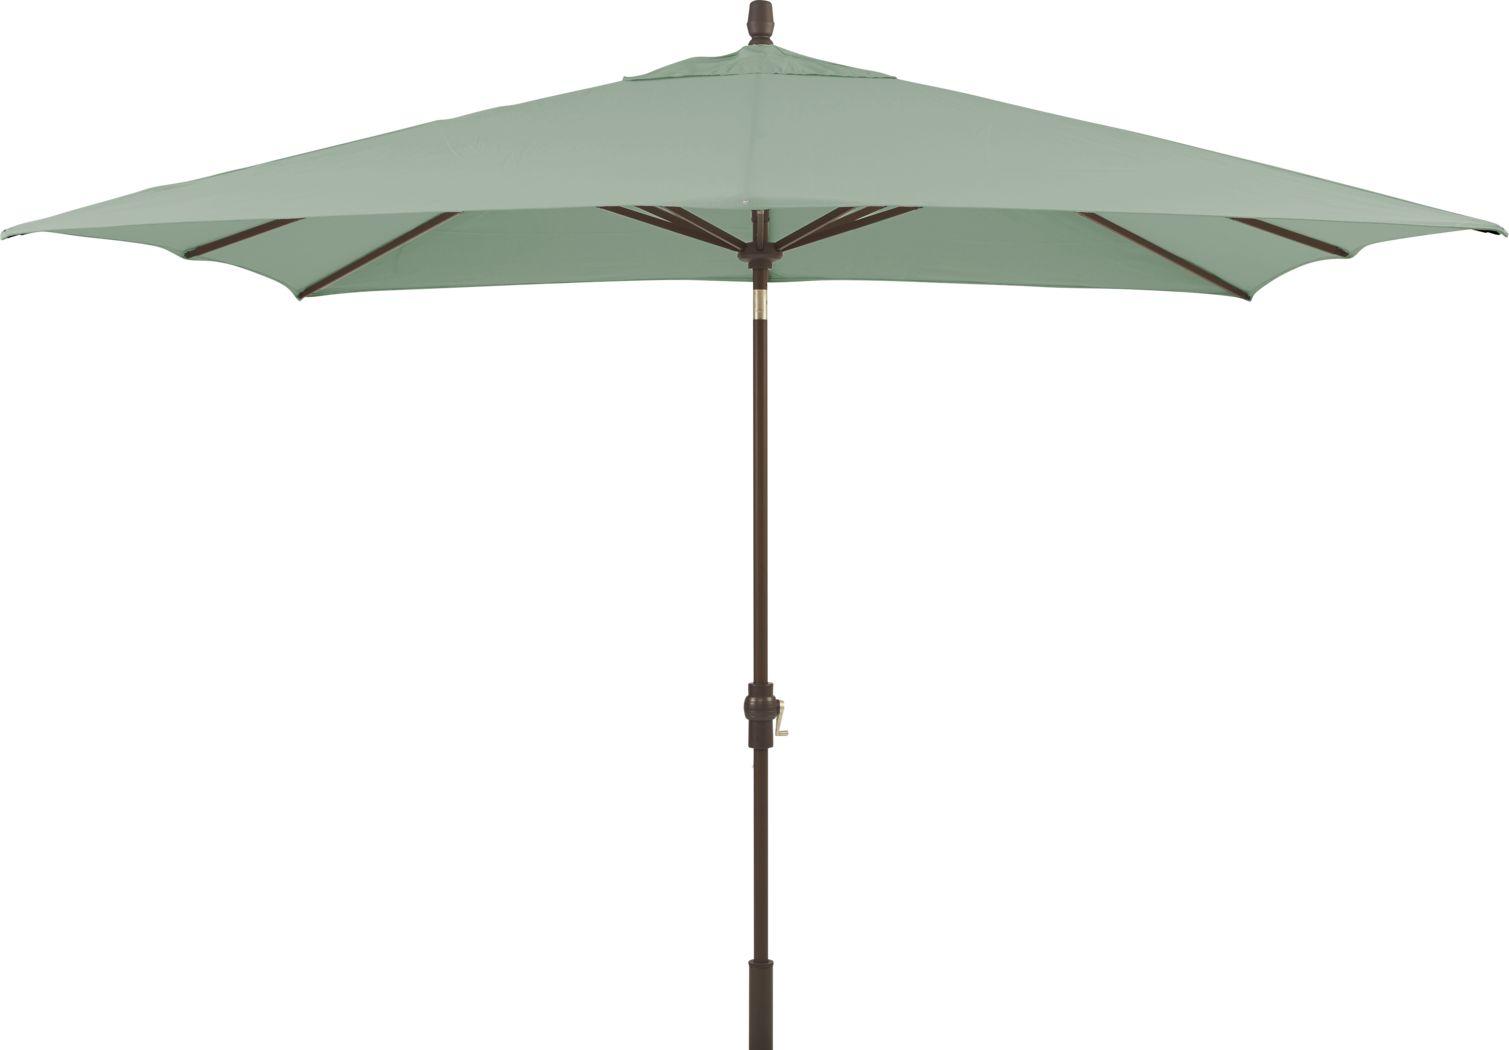 Seaport 8 x 10 Rectangle Seafoam Outdoor Umbrella